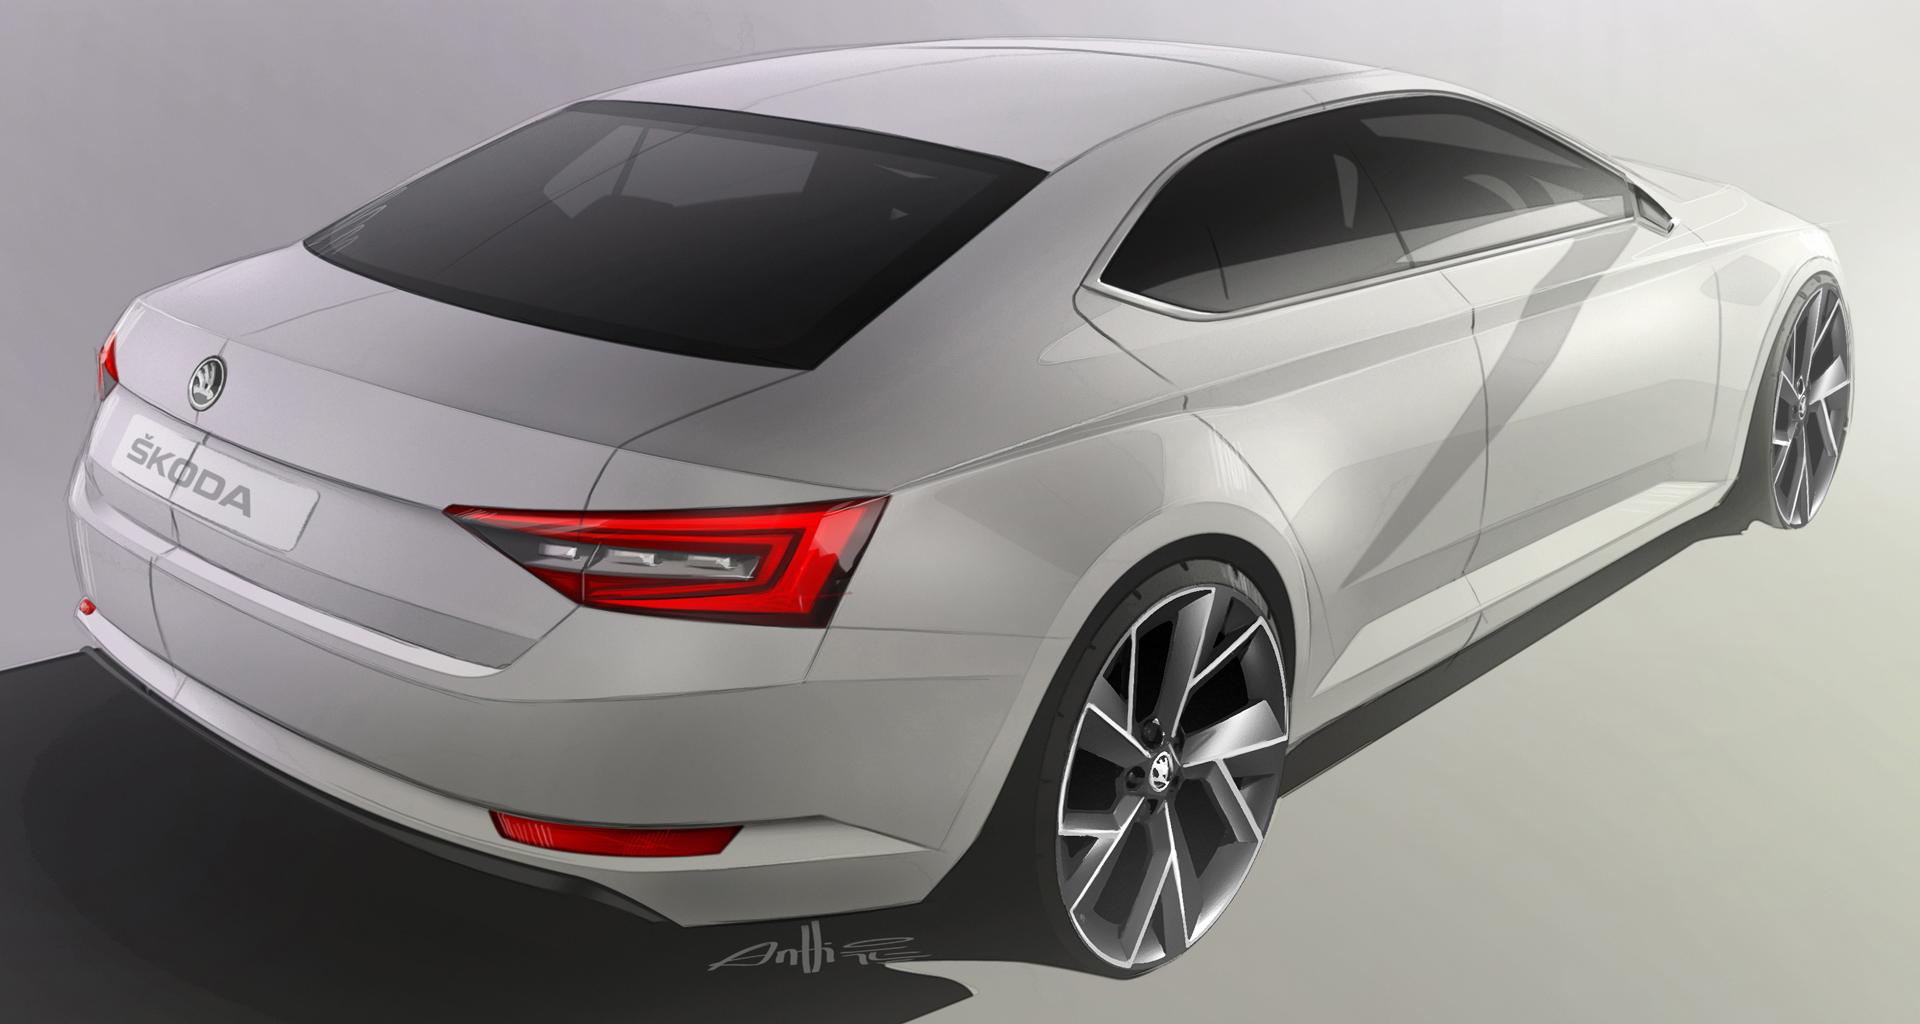 Škoda Superb 2015 - sketch design arrière